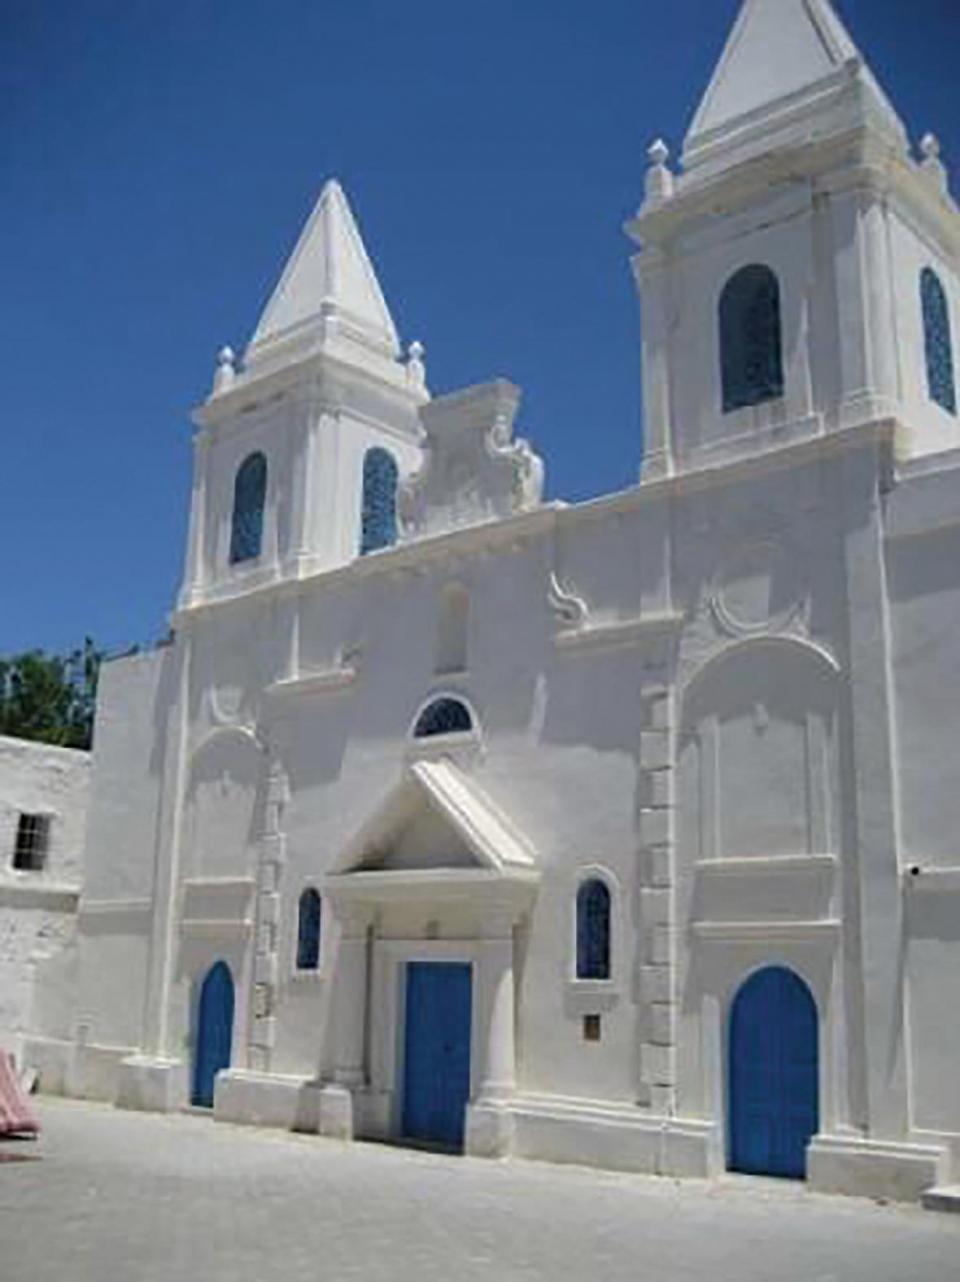 St Joseph church in Houmt el-Souk, in Djerba.